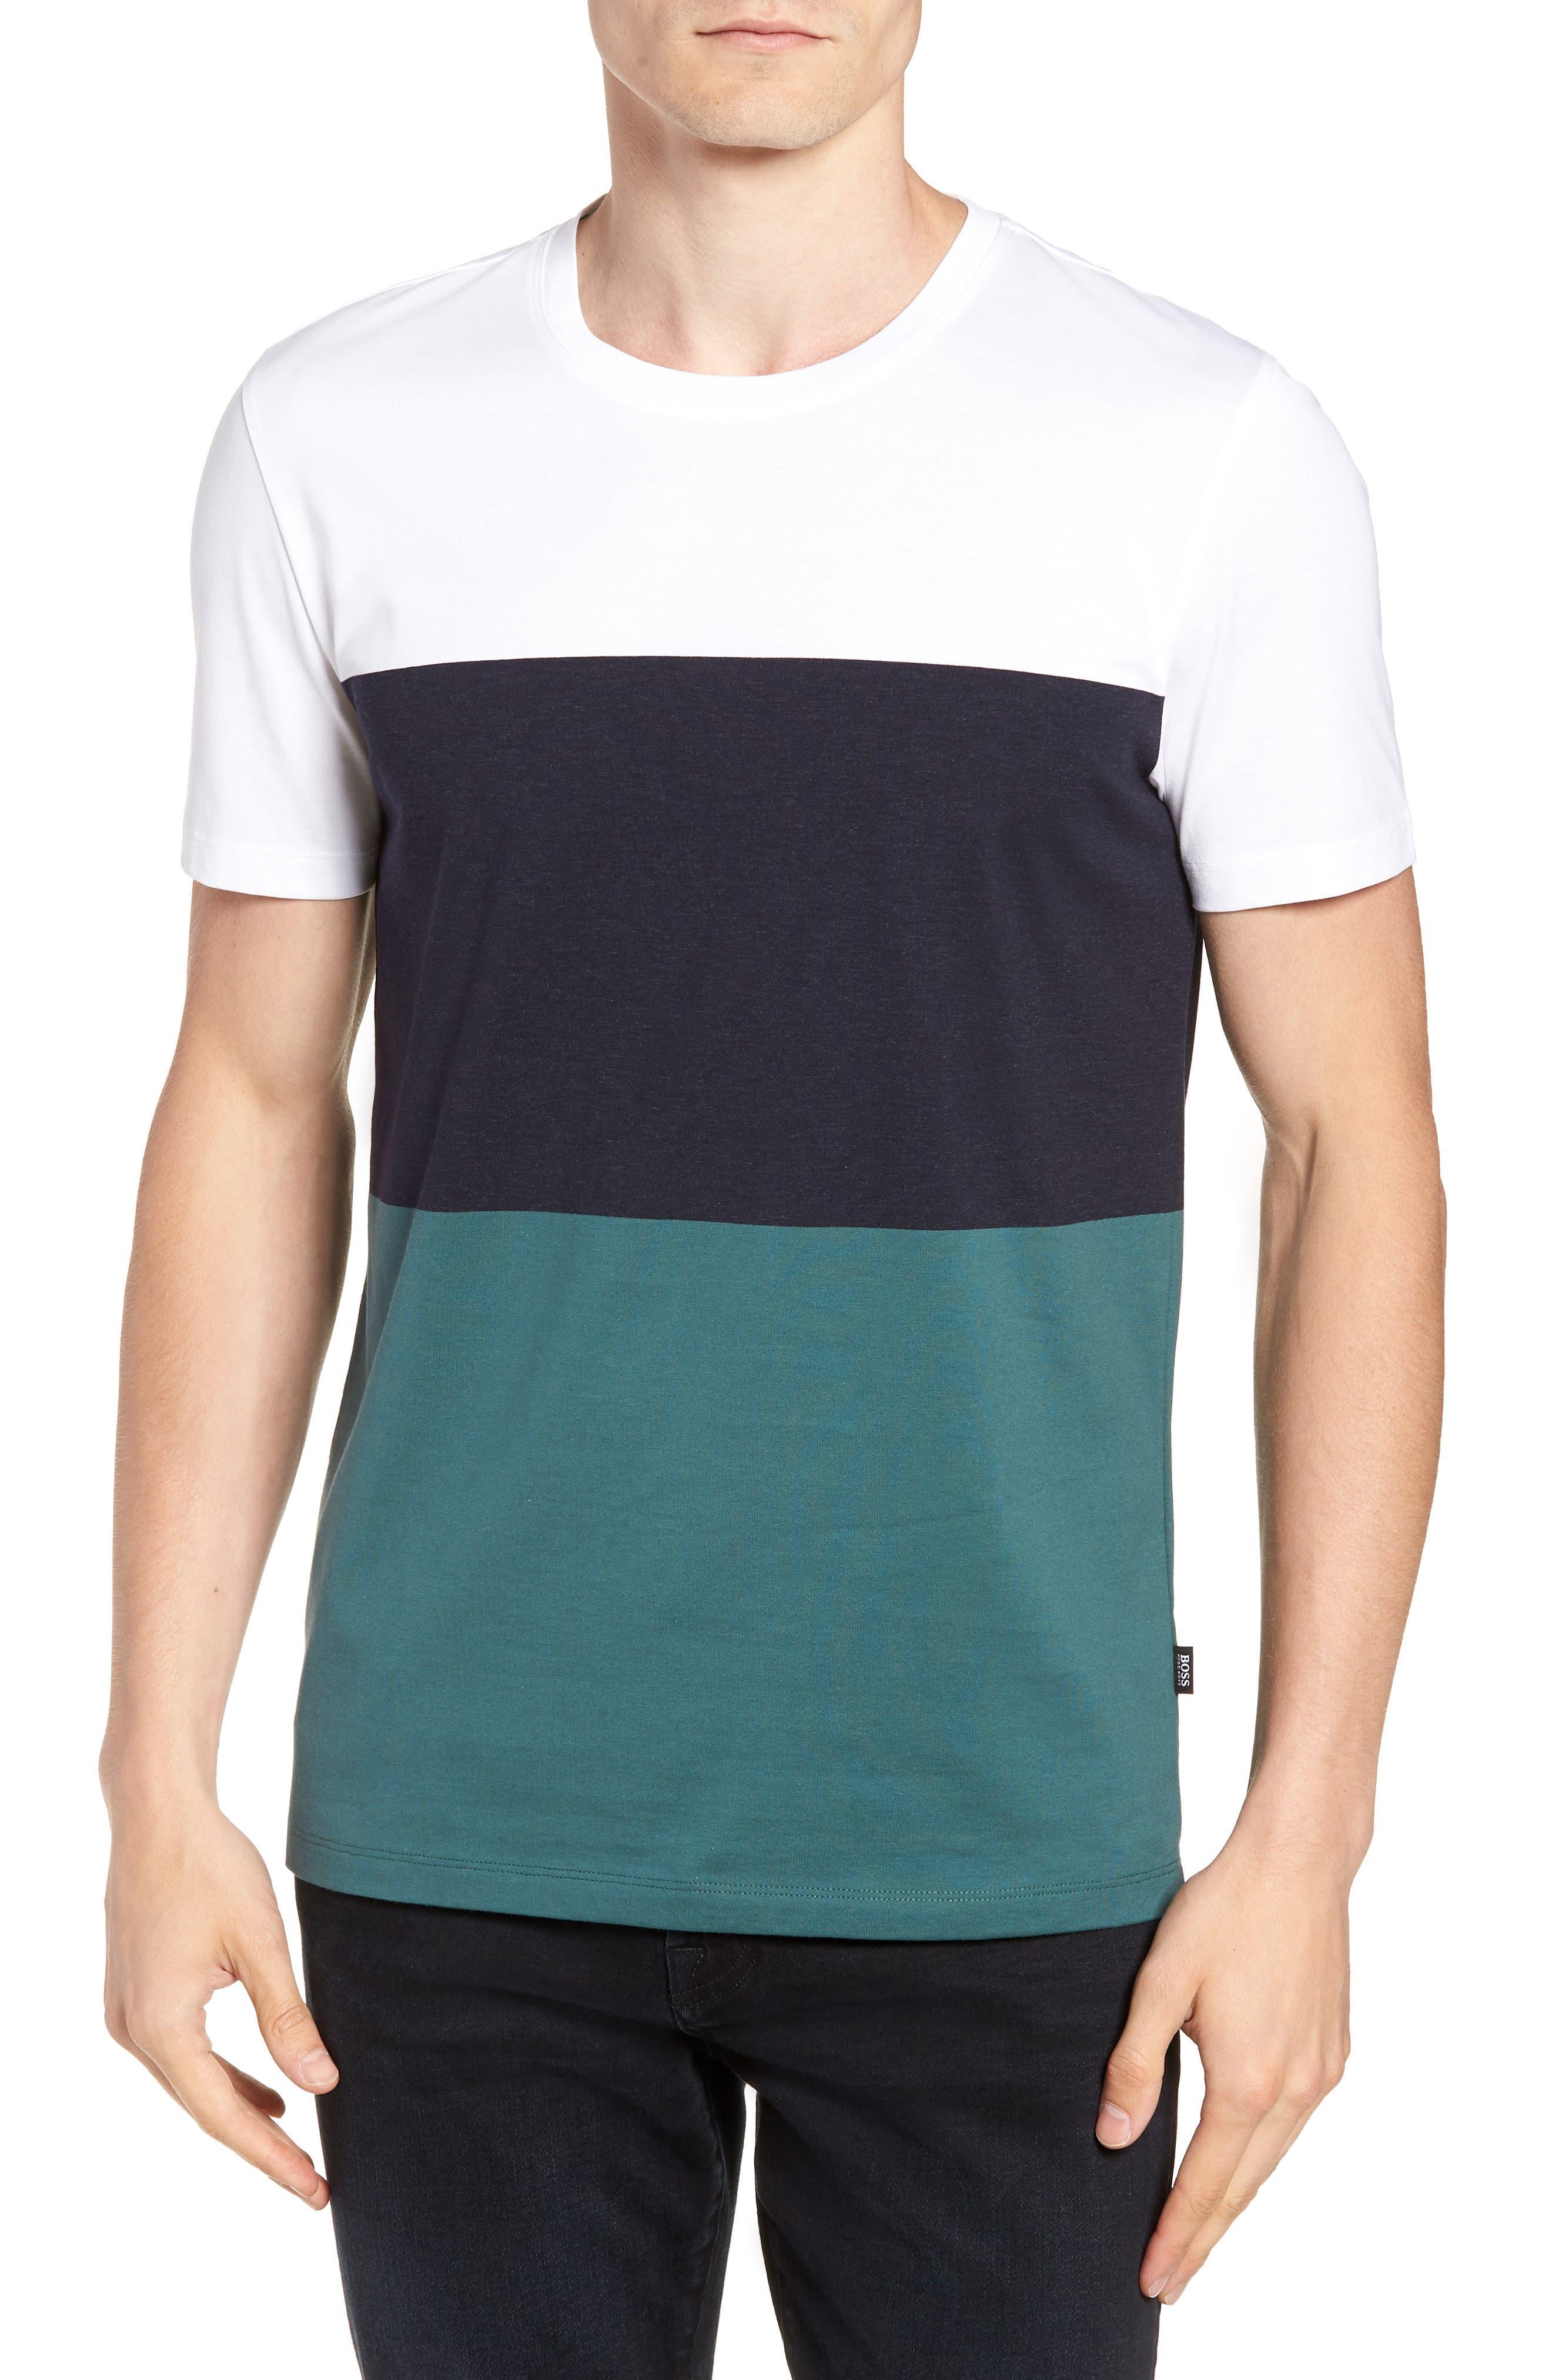 Tessler Colorblock Slim Fit T-Shirt,                             Main thumbnail 1, color,                             BLUE